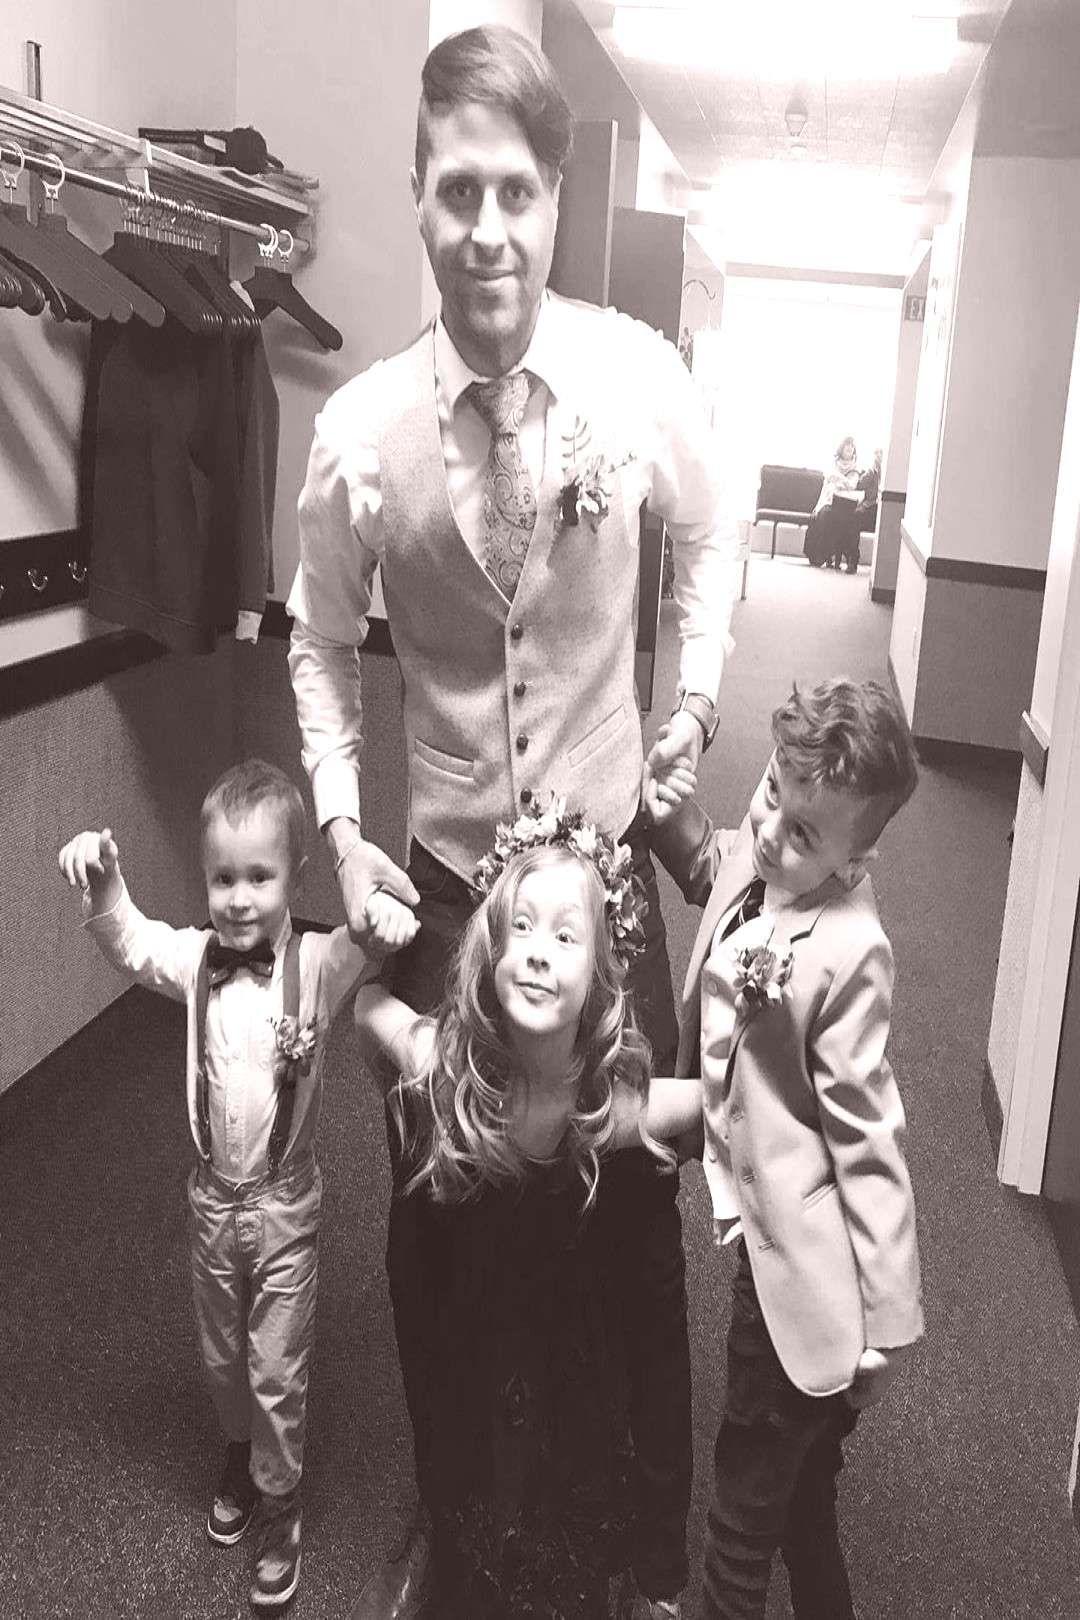 #peoplepeople #weddingday #kidsworld #fitworld #standing #nephews #fashion #indoor #son #and #4 nephews son kidsworld fashion fitworld weddingdayYou can find Kidsworld and more on our website.nephews son kidsworld fashion fitworld weddingday